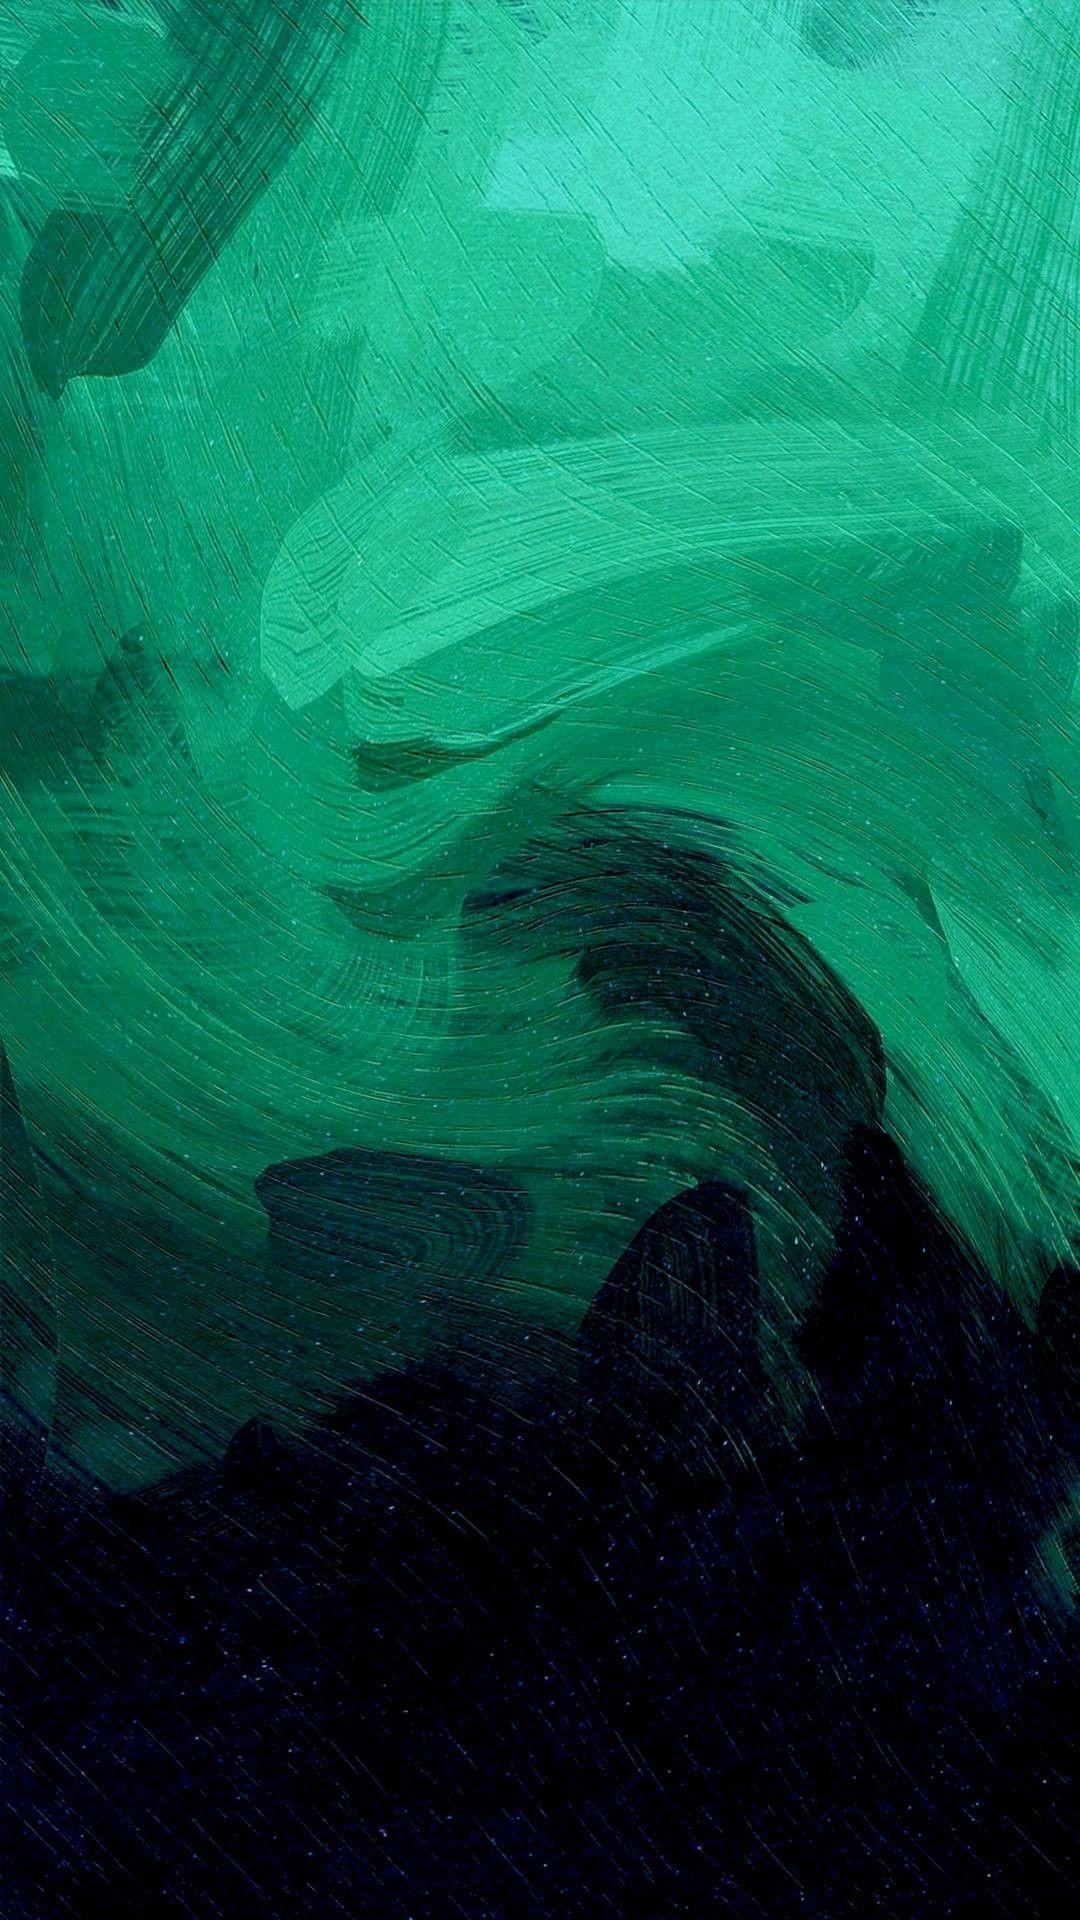 Pin by Parkerdavidson on Green aesthetic   Dark green ...